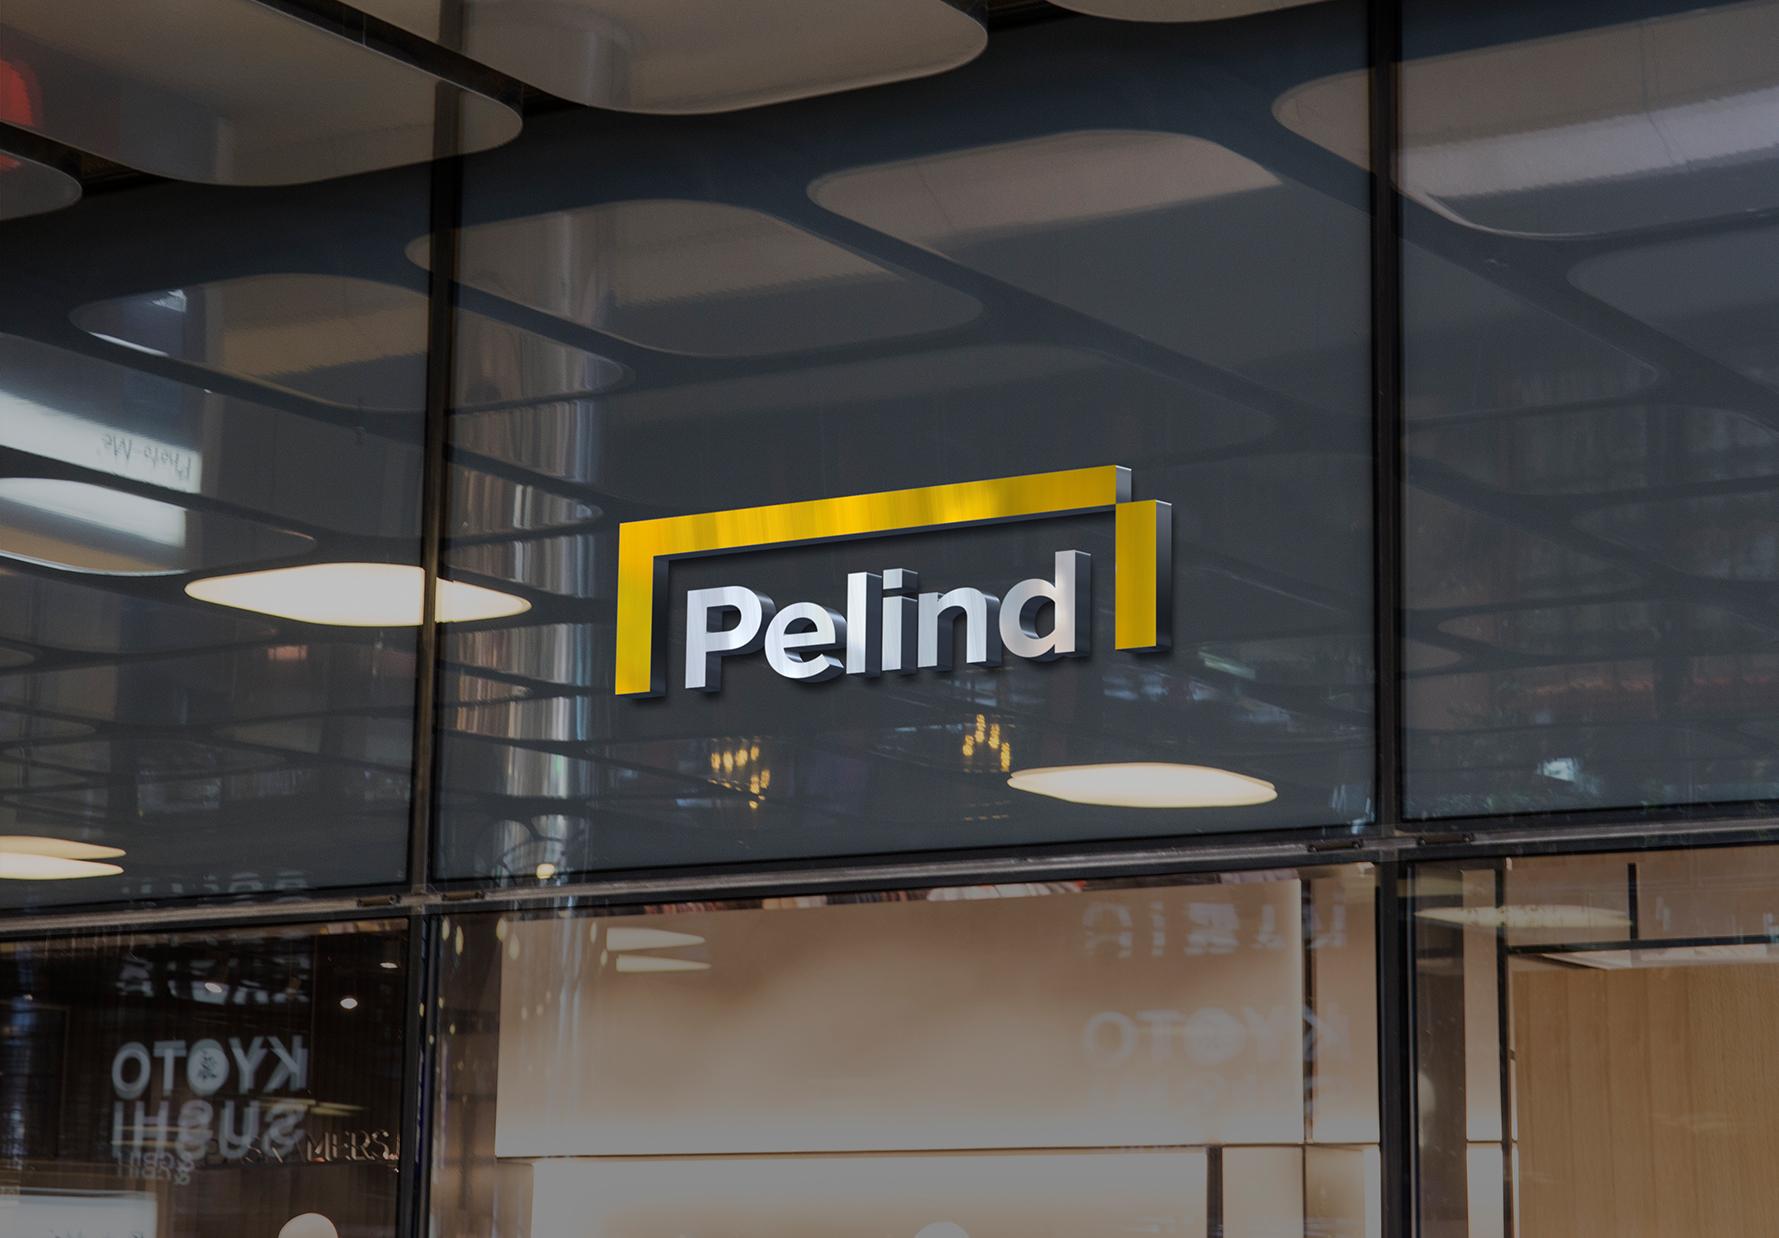 Pelind Logo Building Exterior 3D